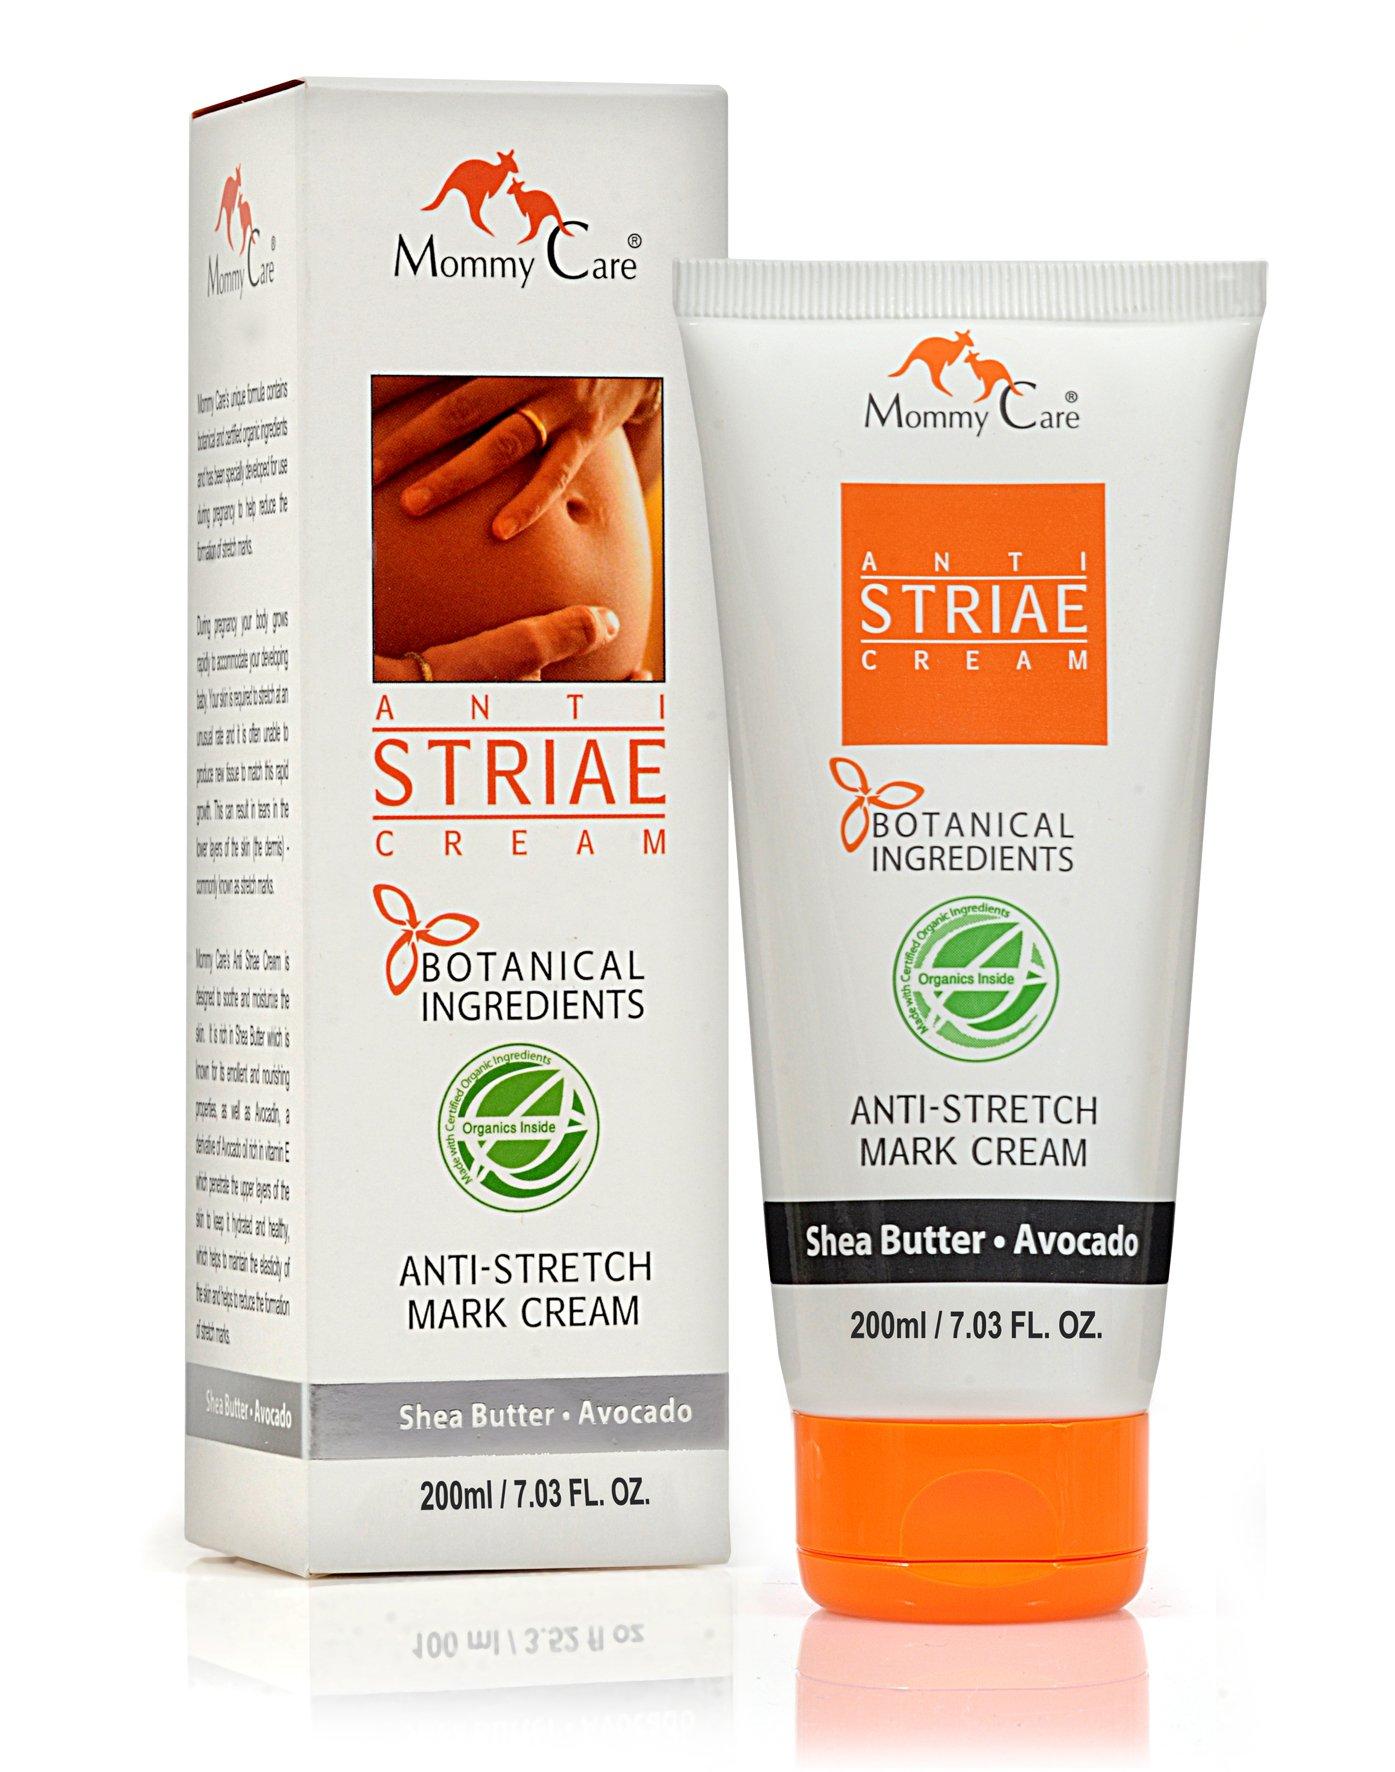 Mommy Care Anti Striae Maternity Pregnancy Stretch Marks Prevention Cellulite Treatment Cream,7.03 Ounce